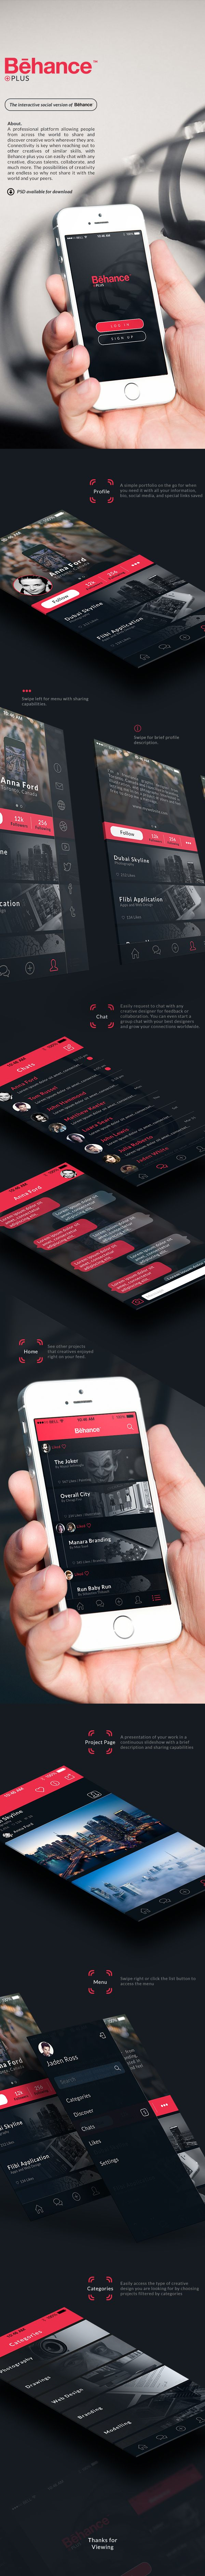 Behance Plus - App Design Concept | Abduzeedo Design Inspiration